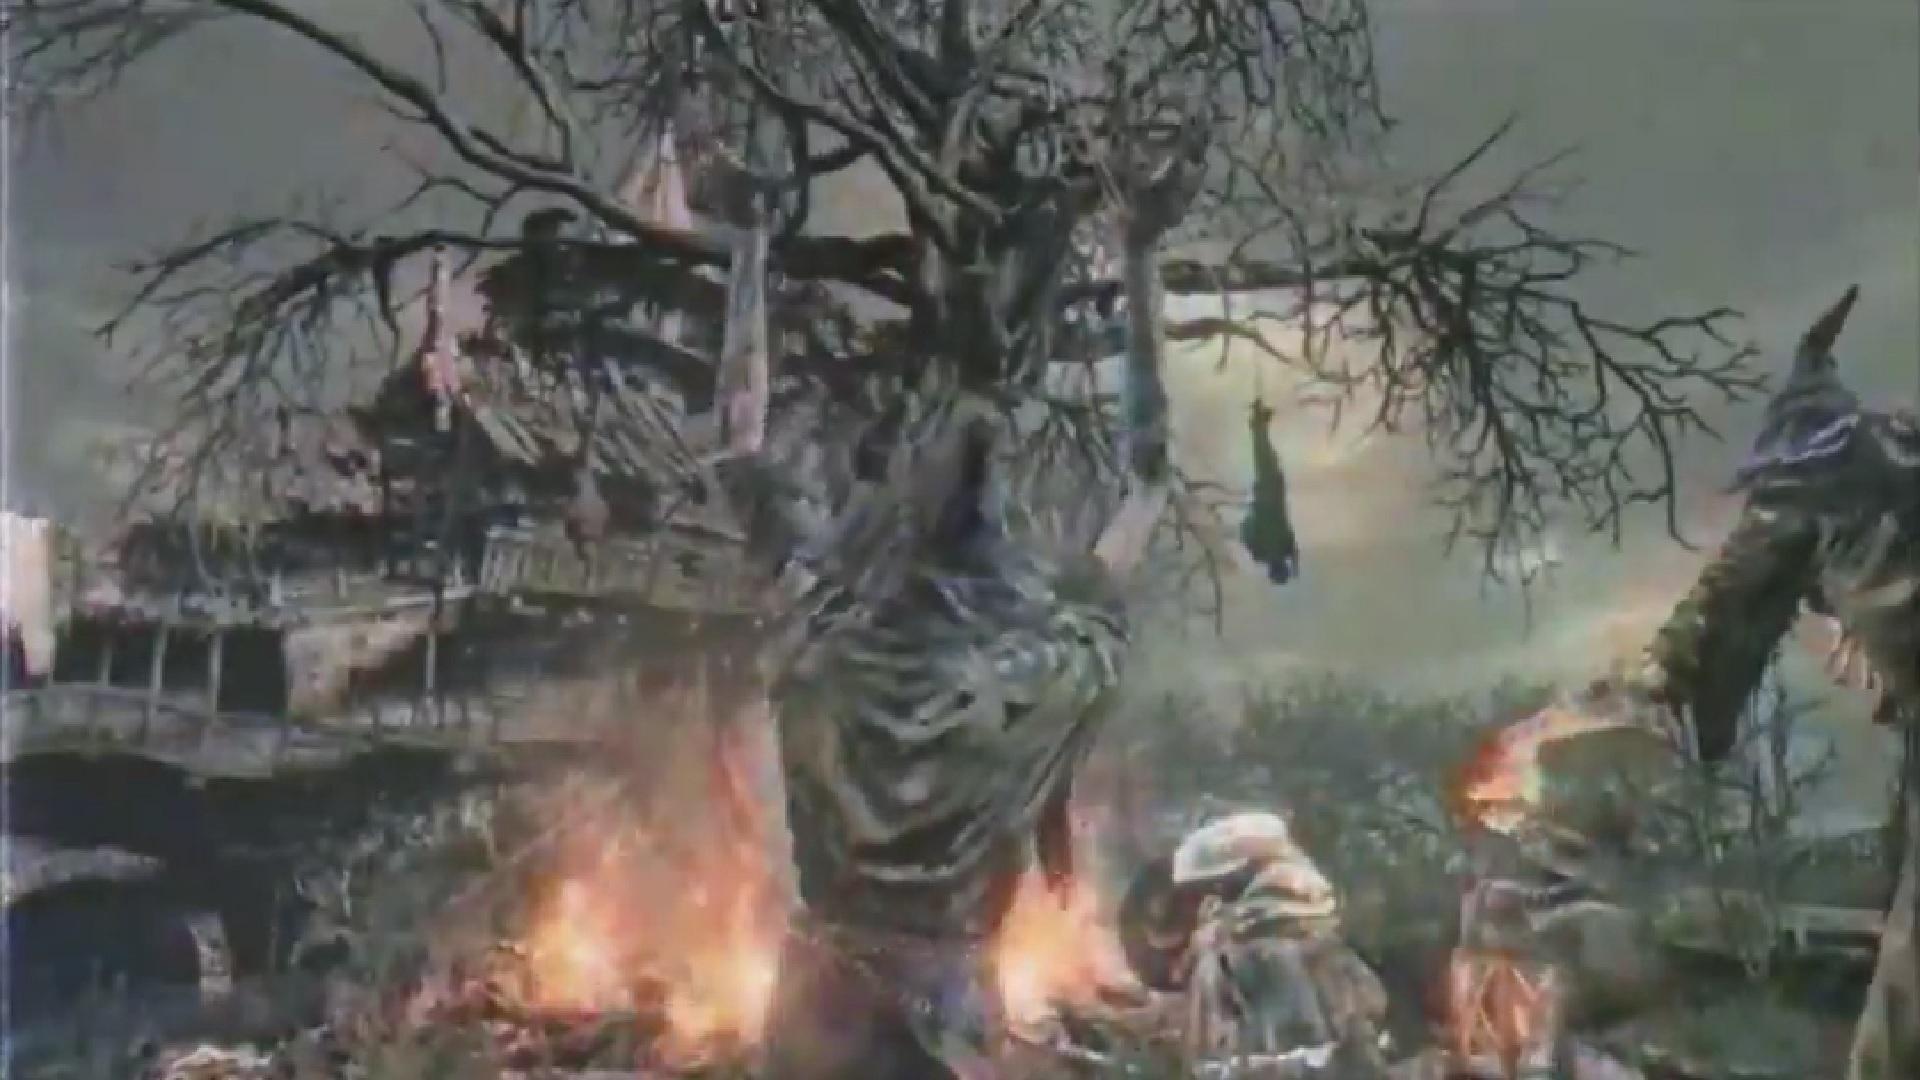 dark-souls-3-gets-a-killer-80s-commercial-social.jpg